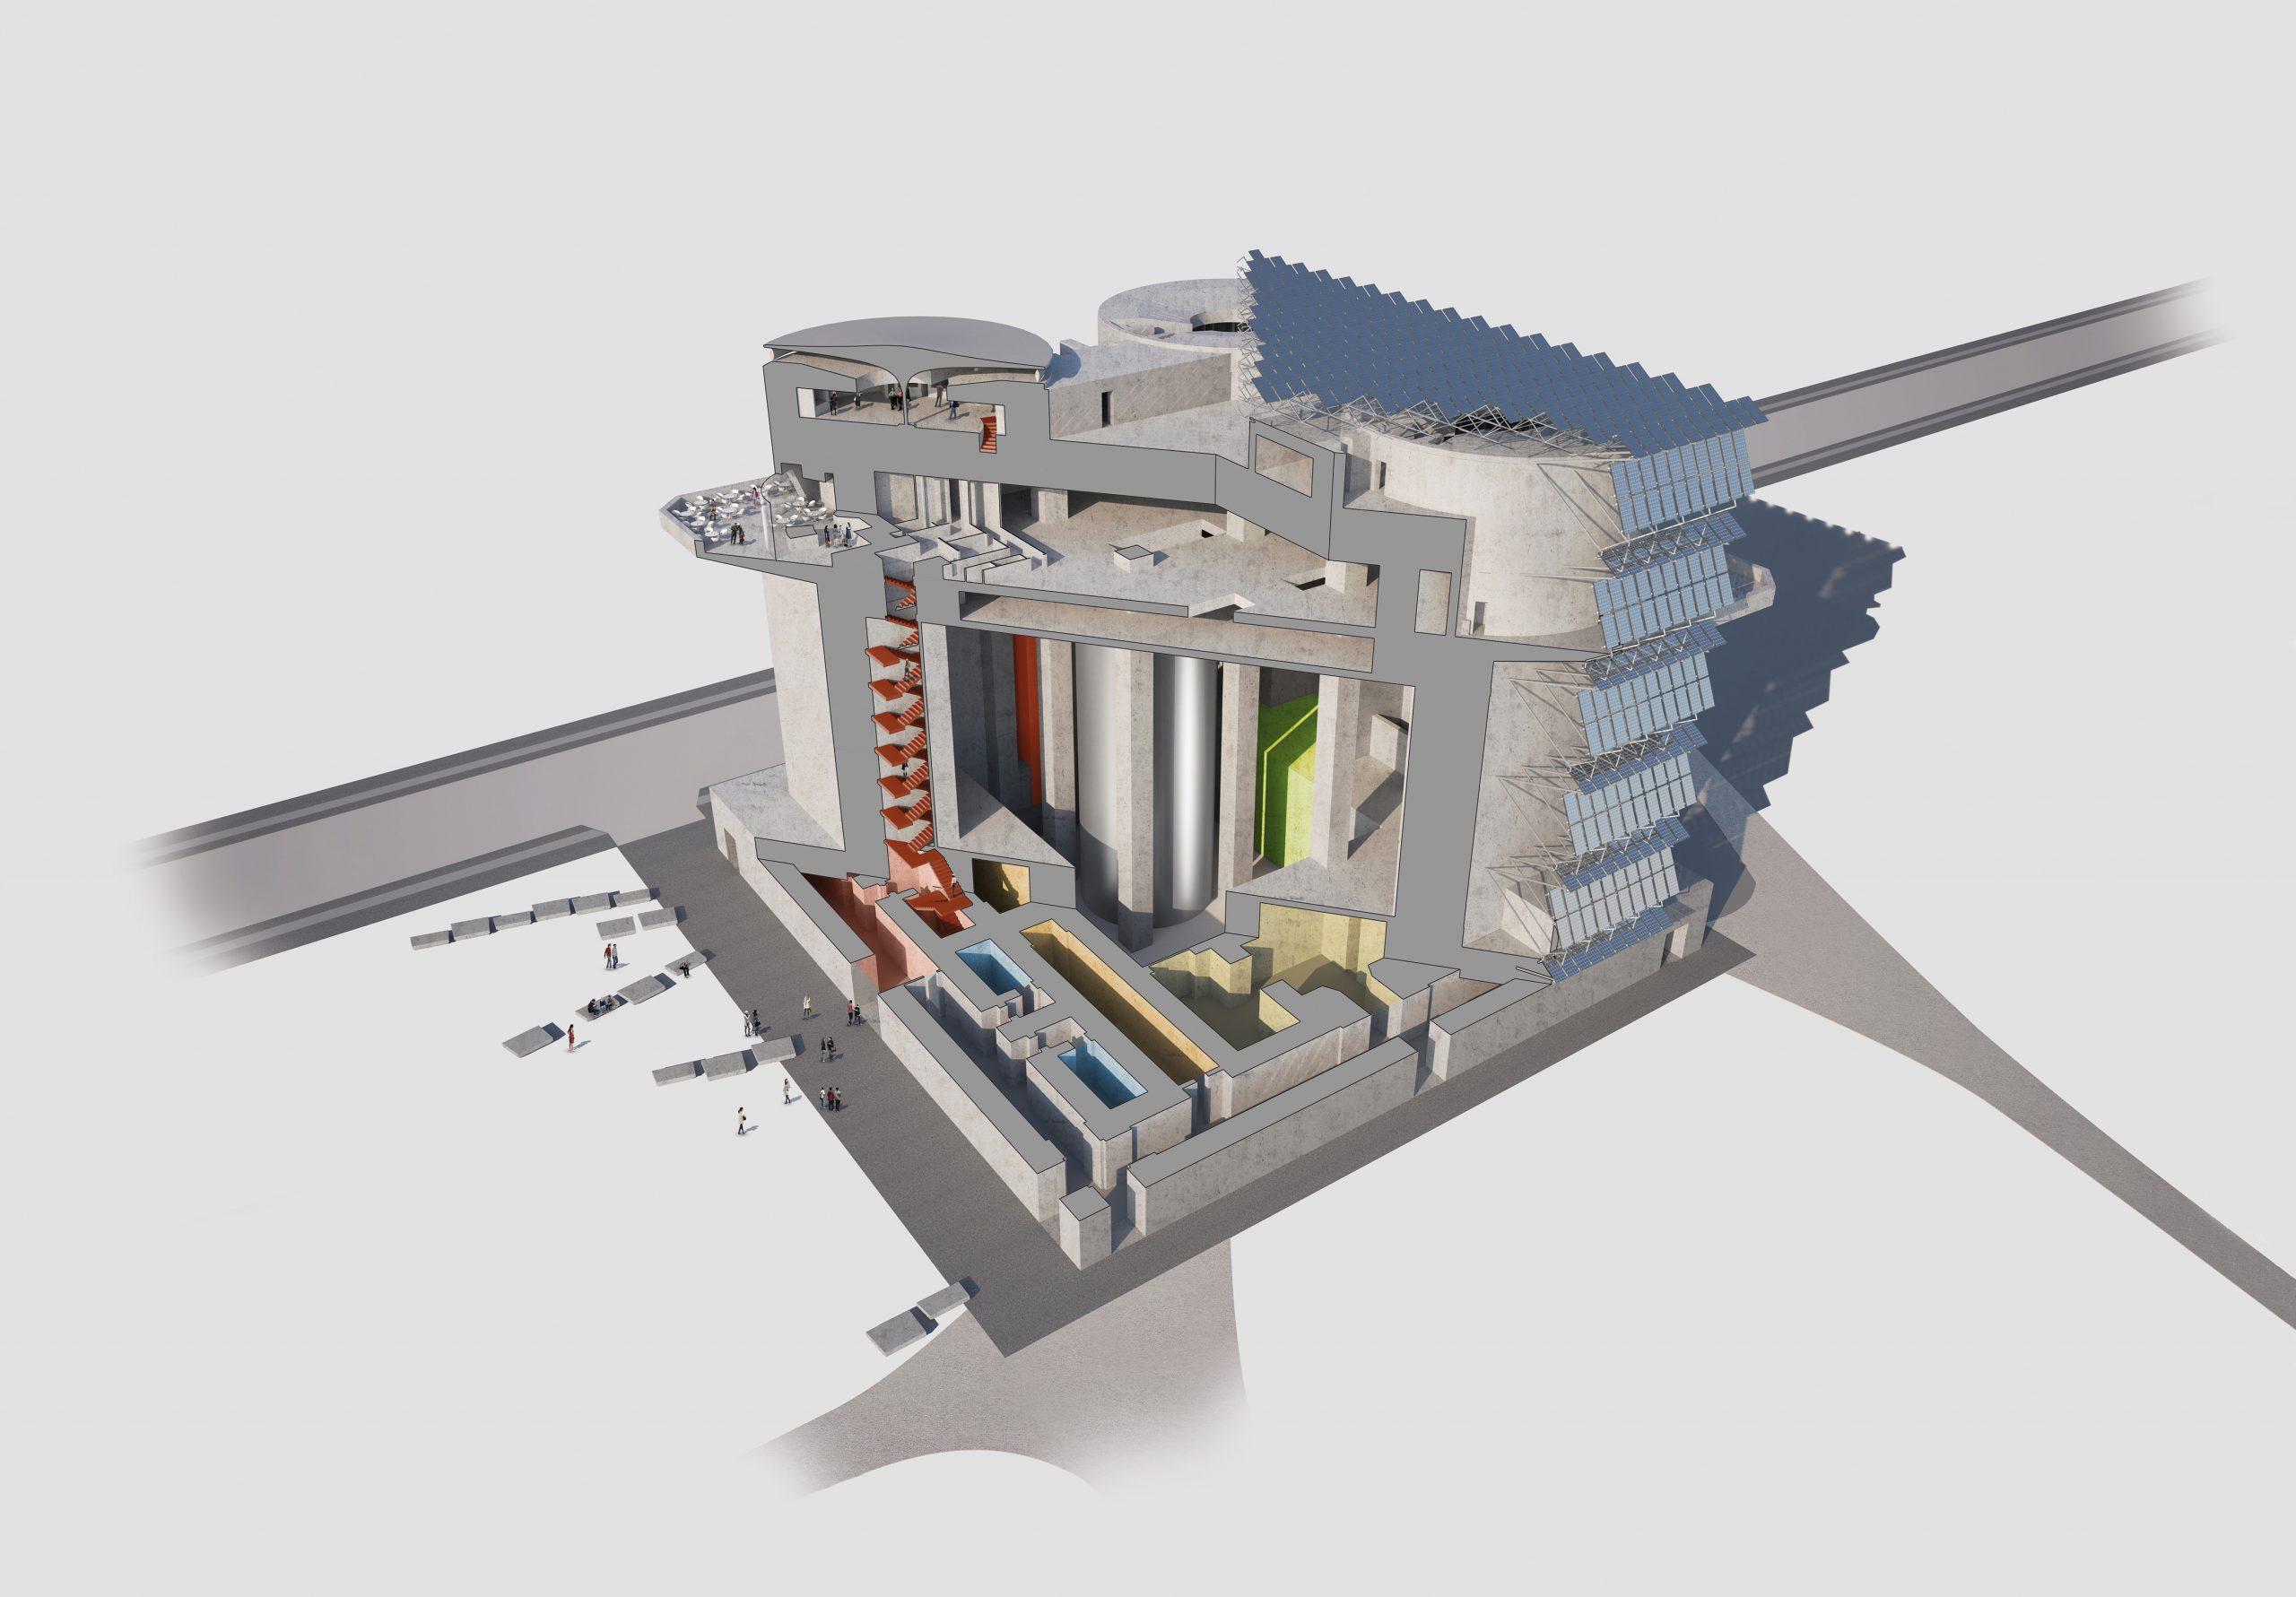 Technologien des Energiebunkers in Wilhelmsburg